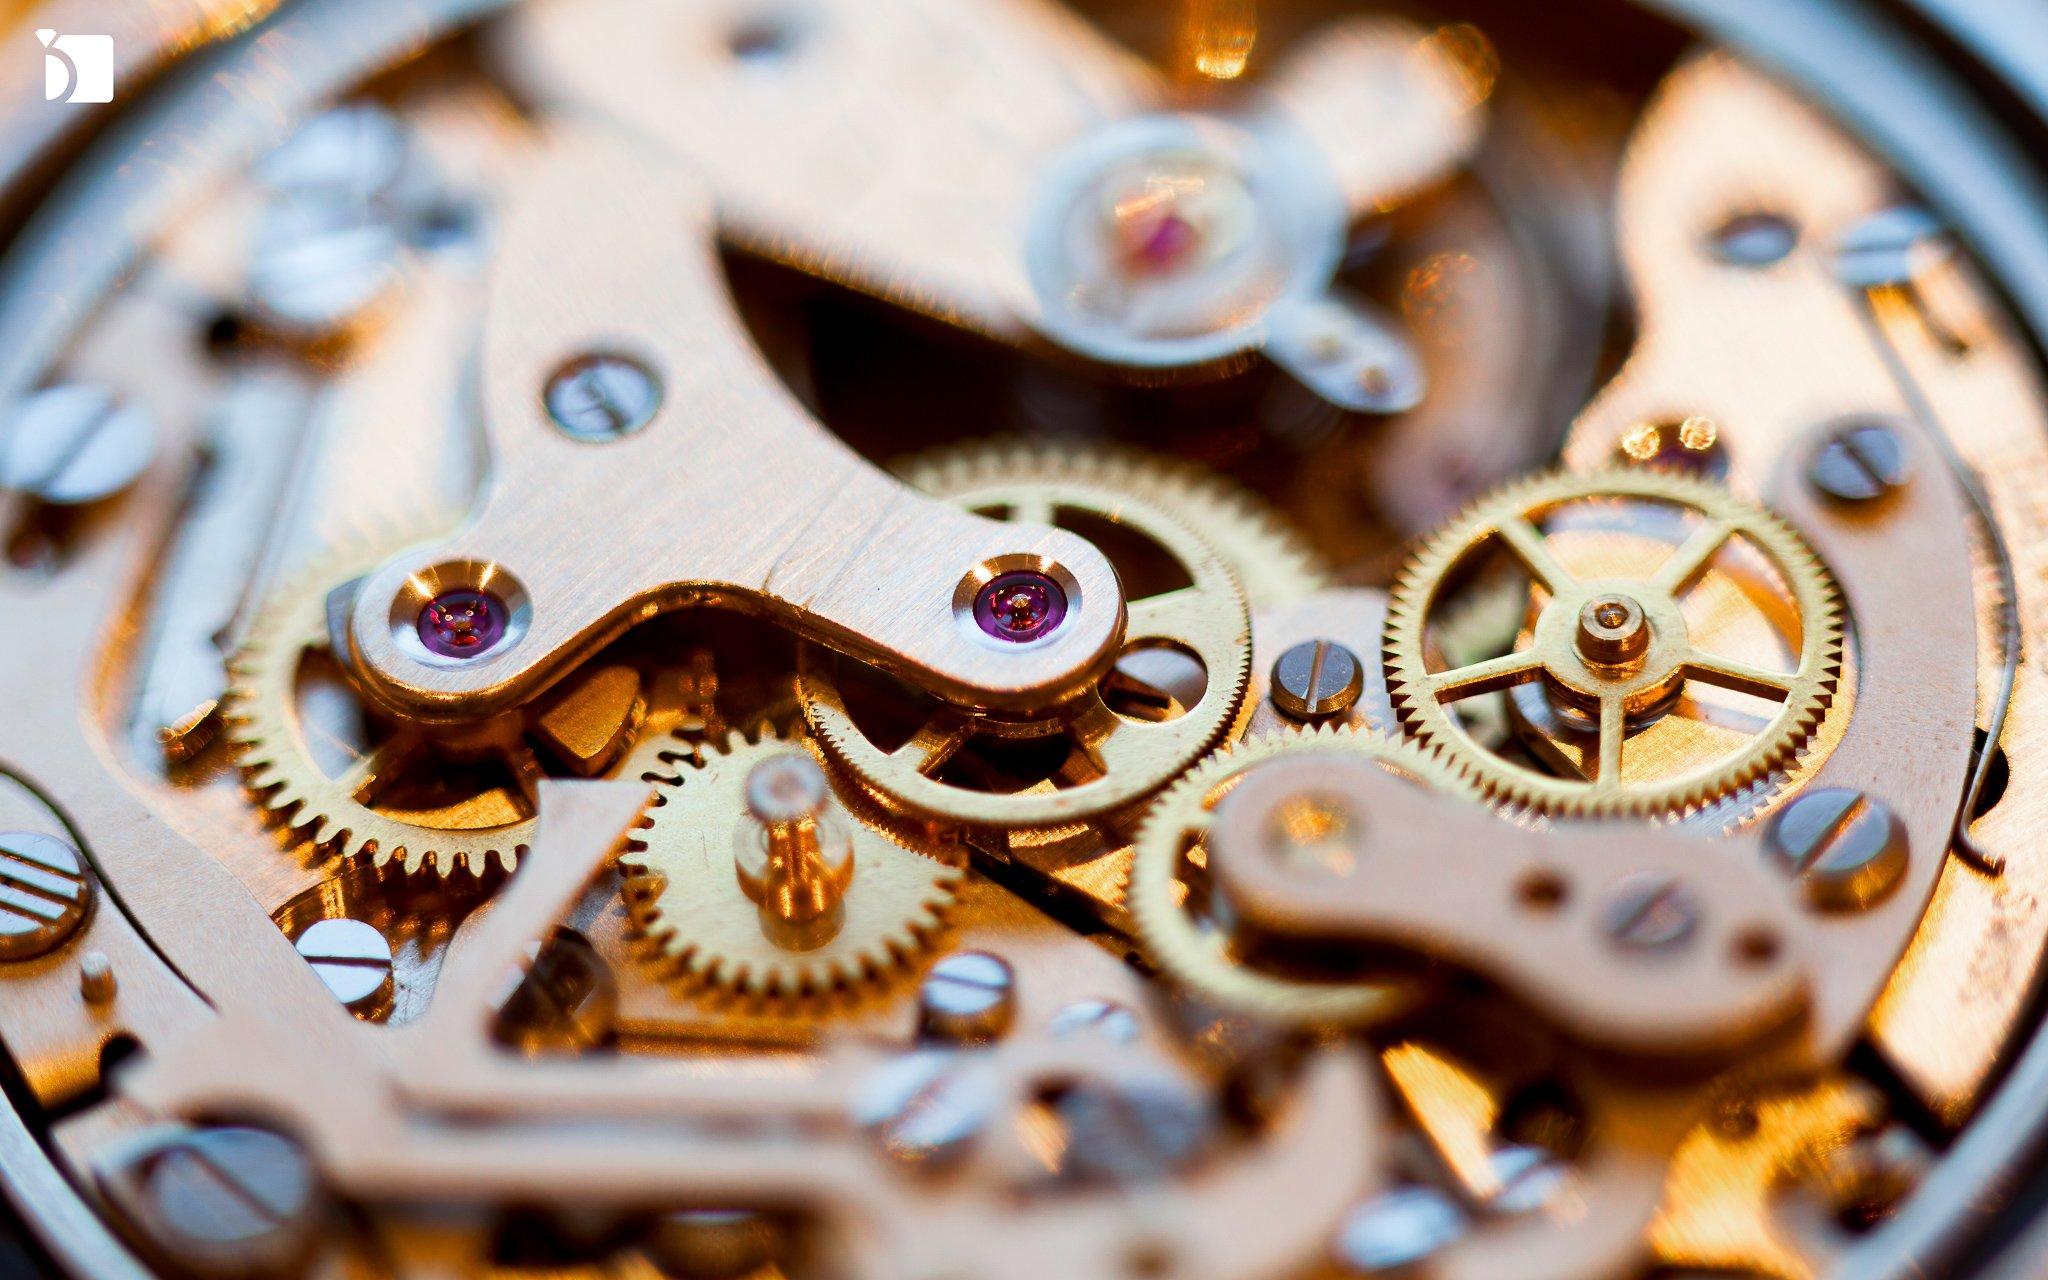 Image showcasing mechanical watch movement